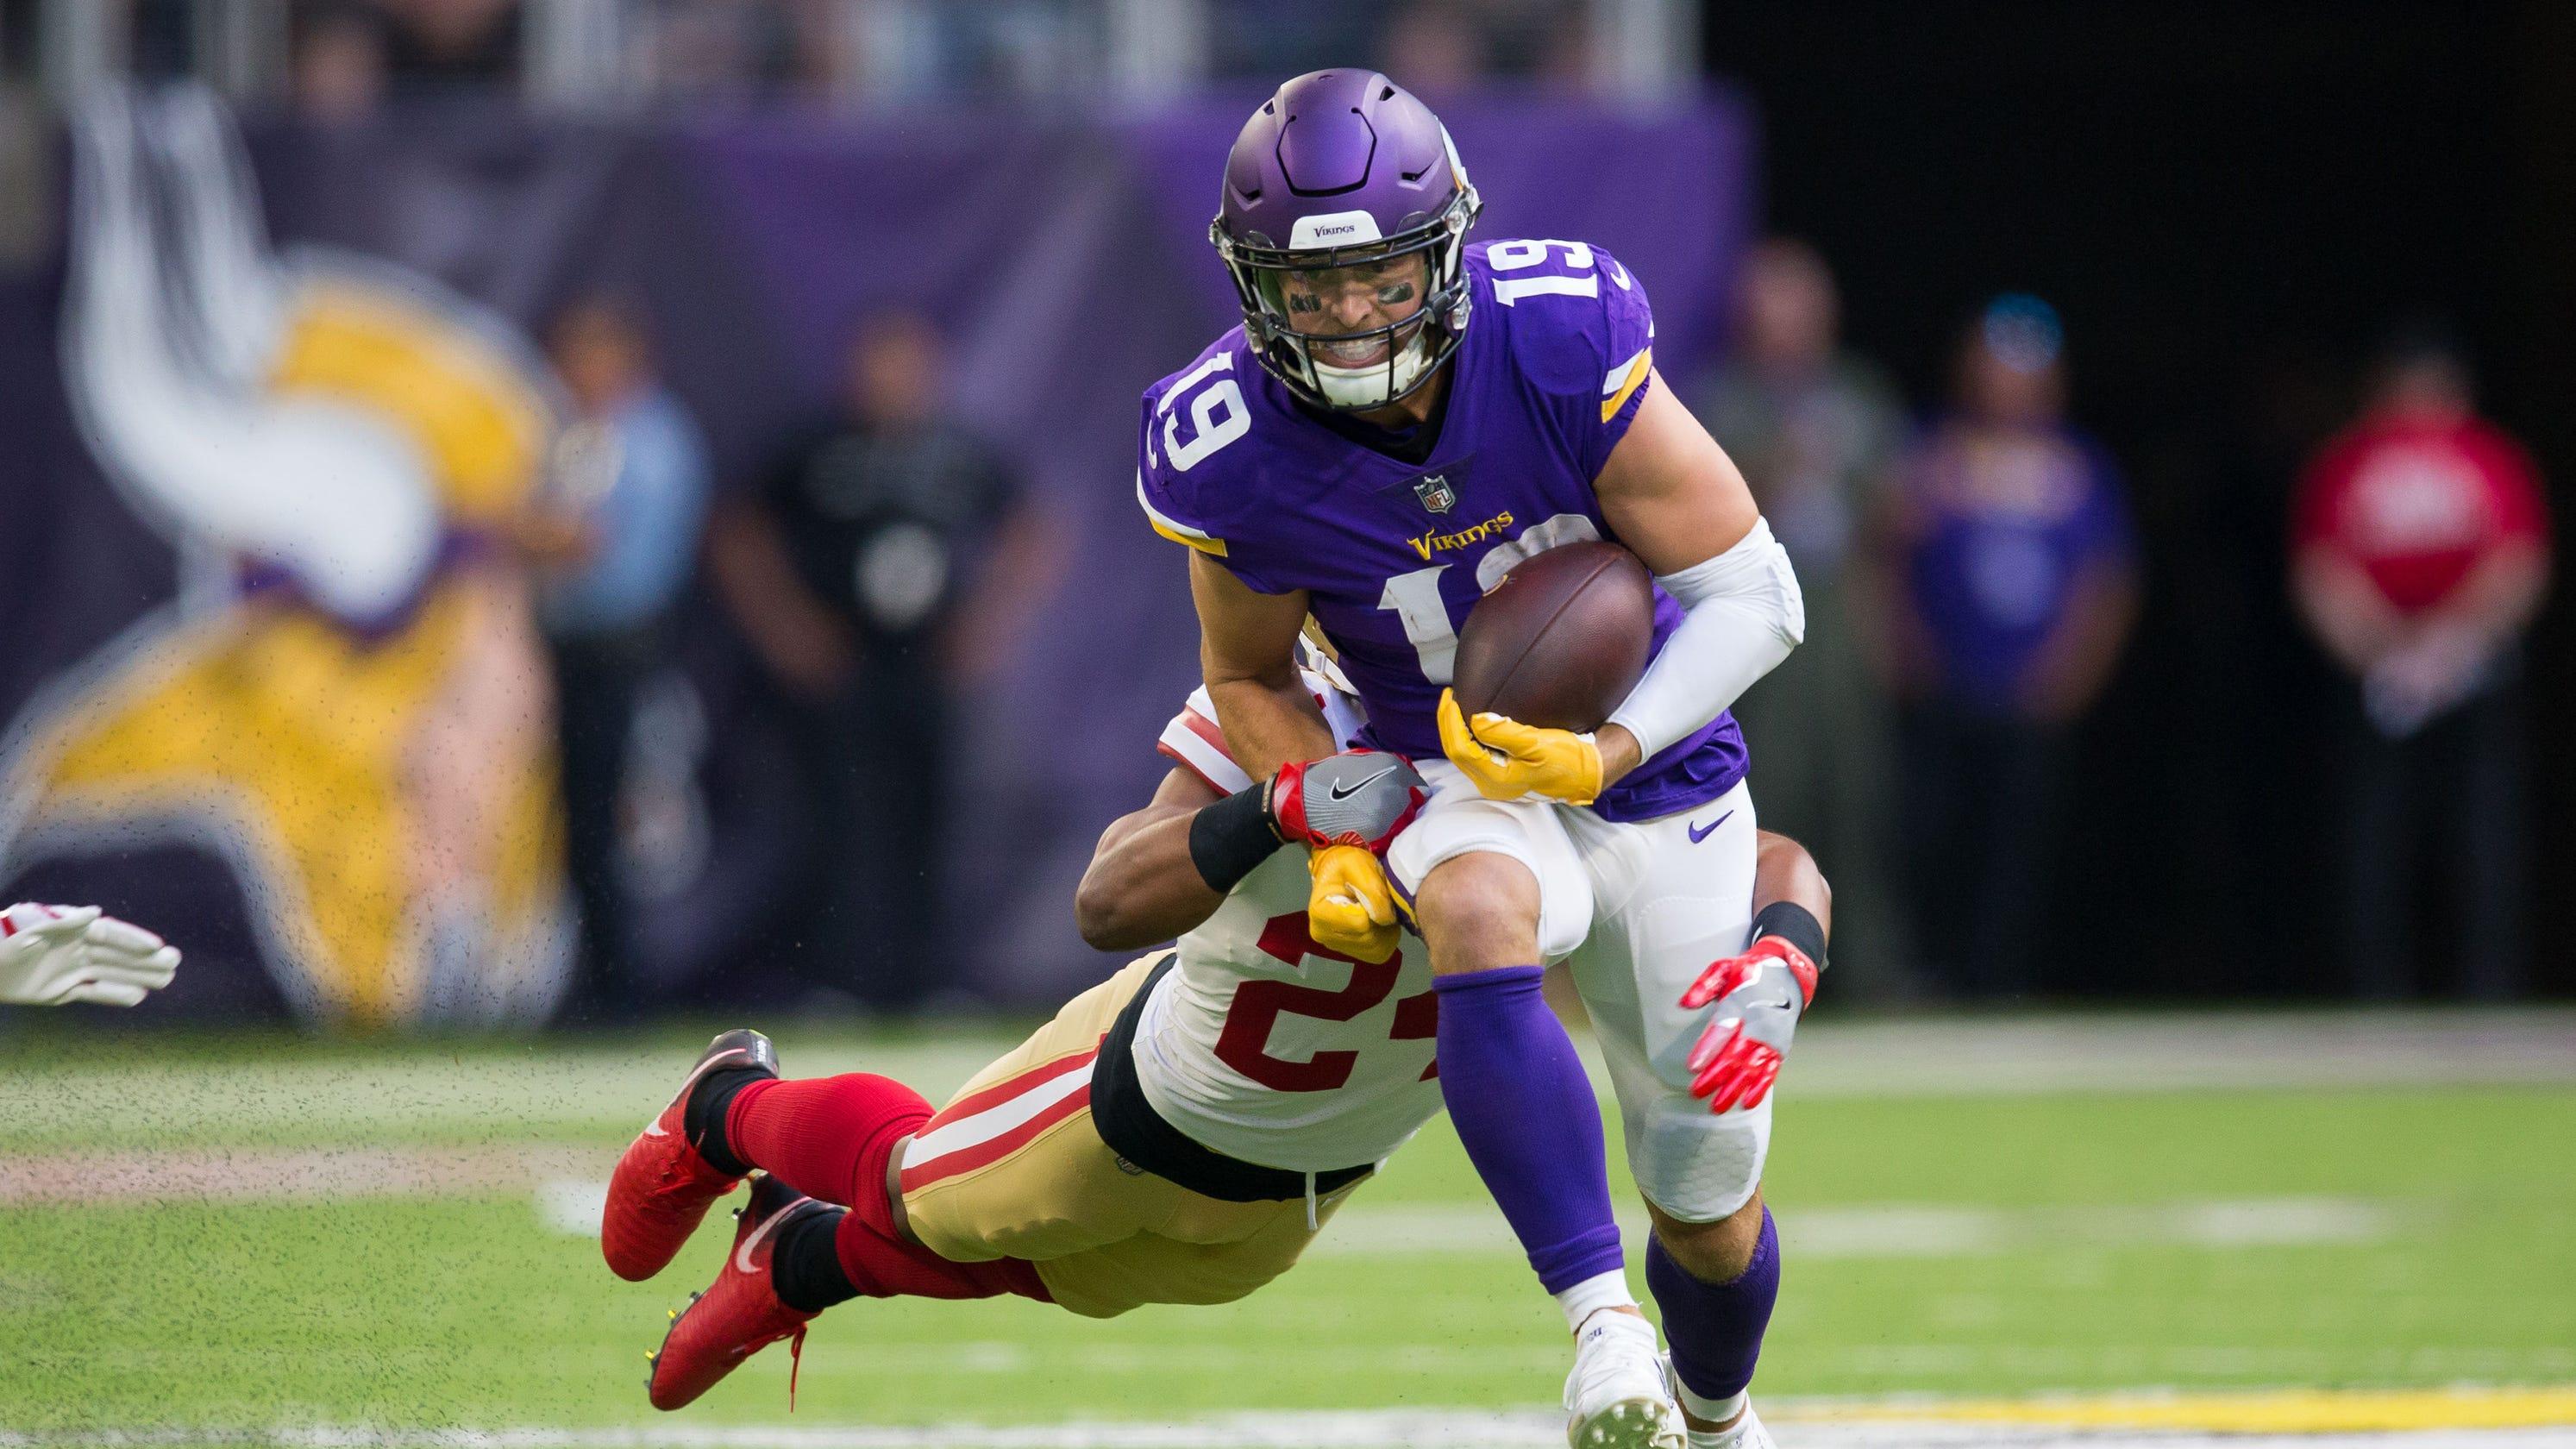 b399fc2a Adam Thielen, Vikings WR, is still overlooked after NFL record start